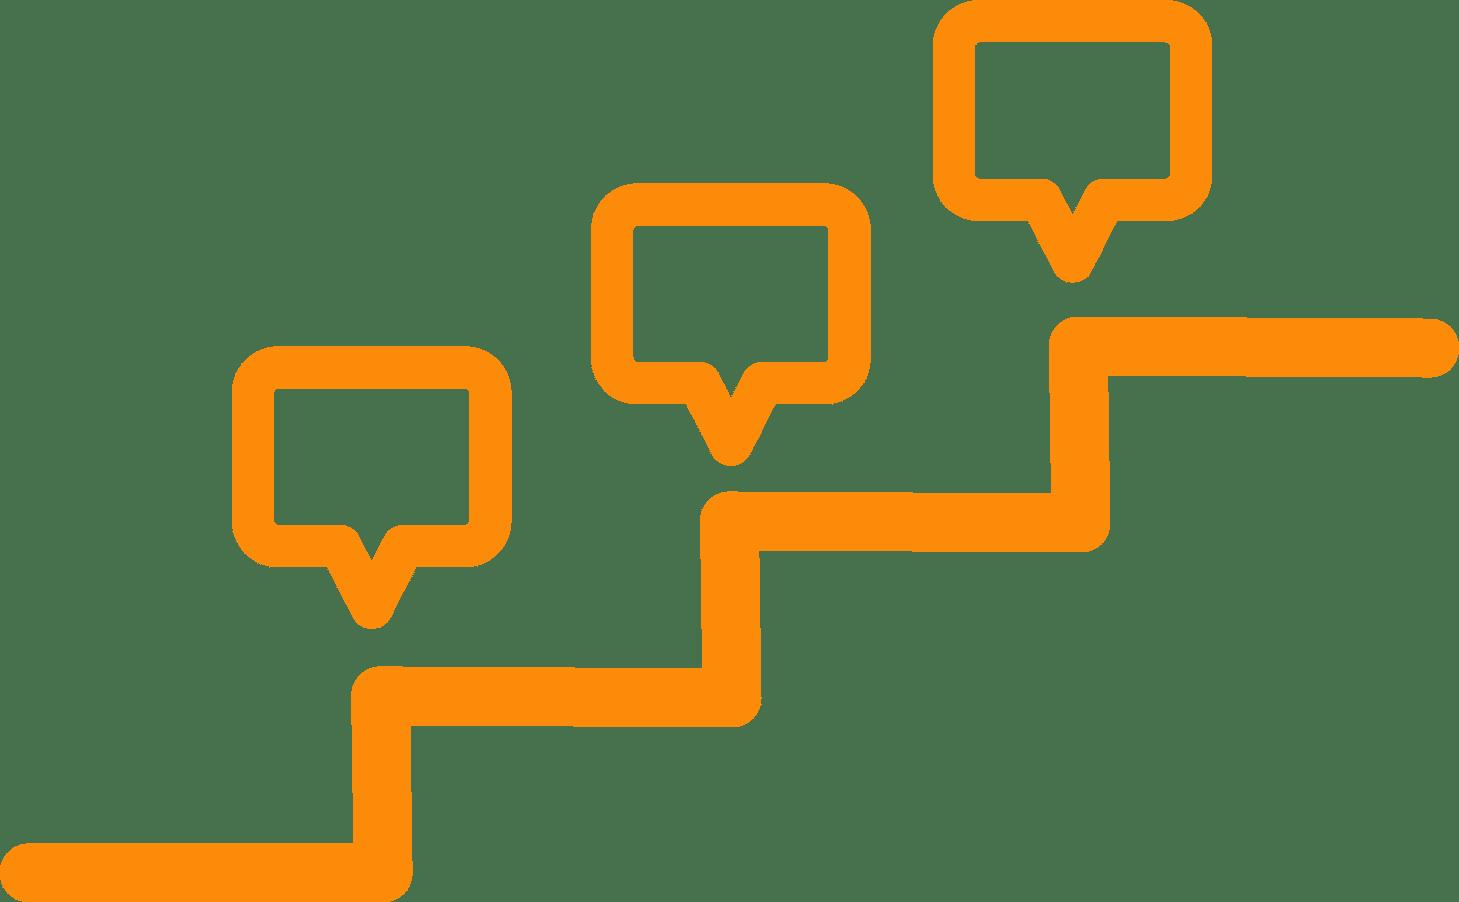 Stegvis utveckling affärssystem SAP